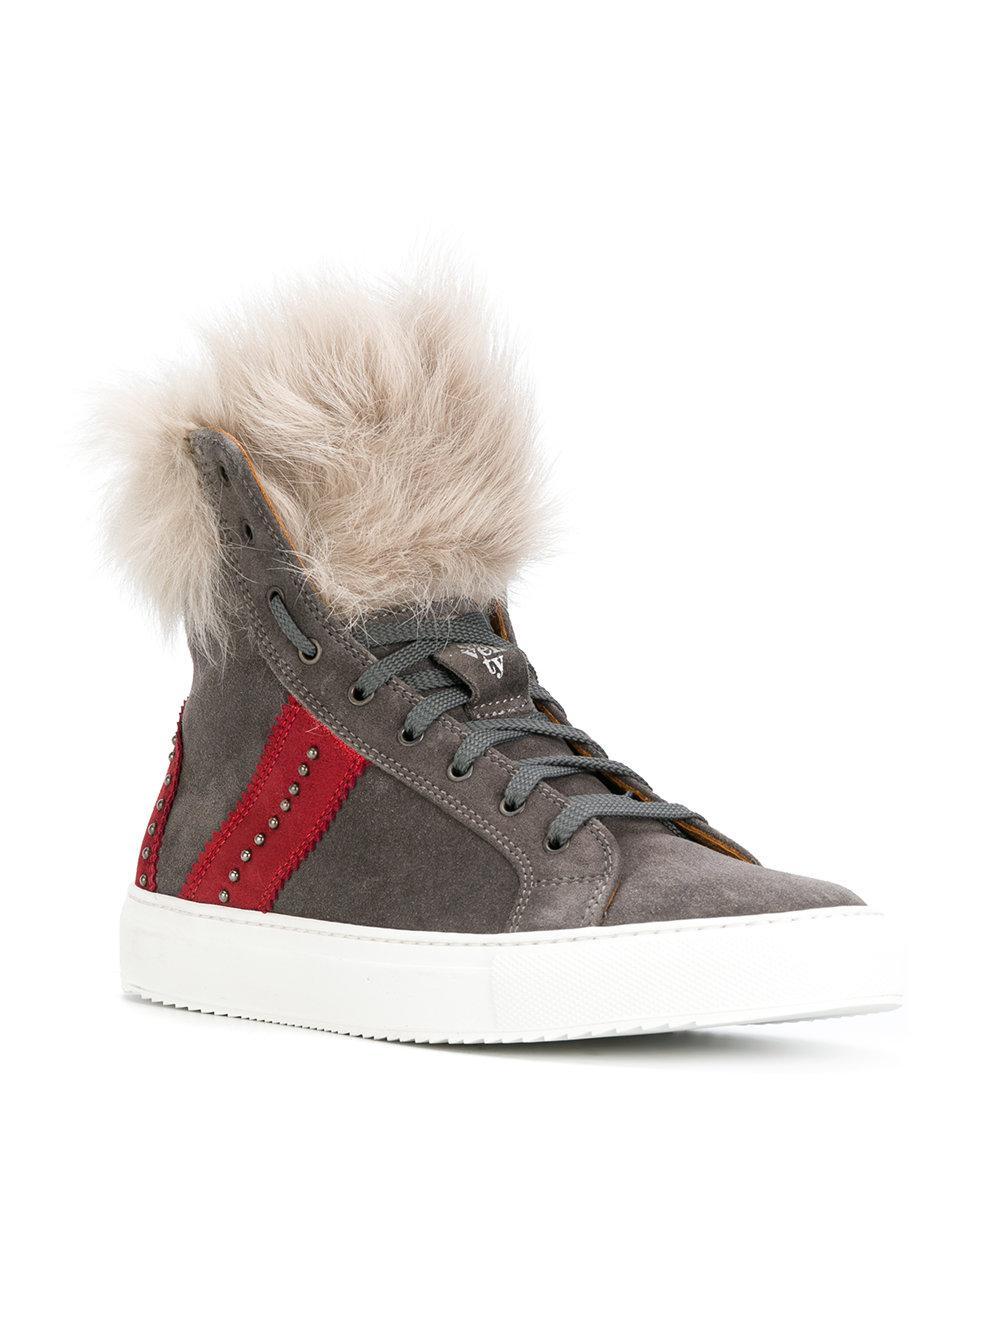 Eleventy Stripe Detail Fur Sneakers in Grey (Grey)